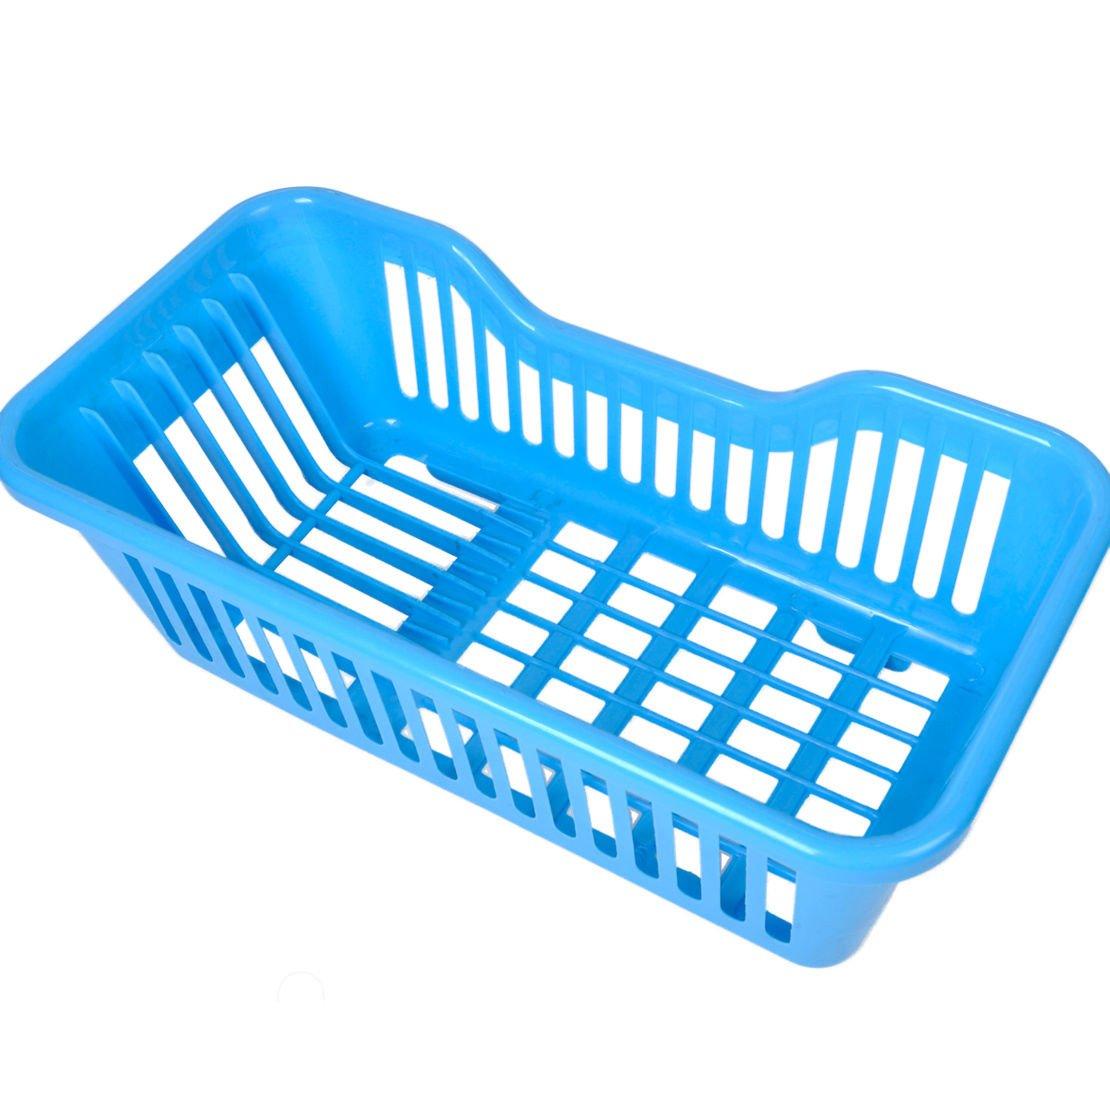 Amazon.com: MAZIMARK-Kitchen Sink Dish Plate Drainer Drying Rack ...